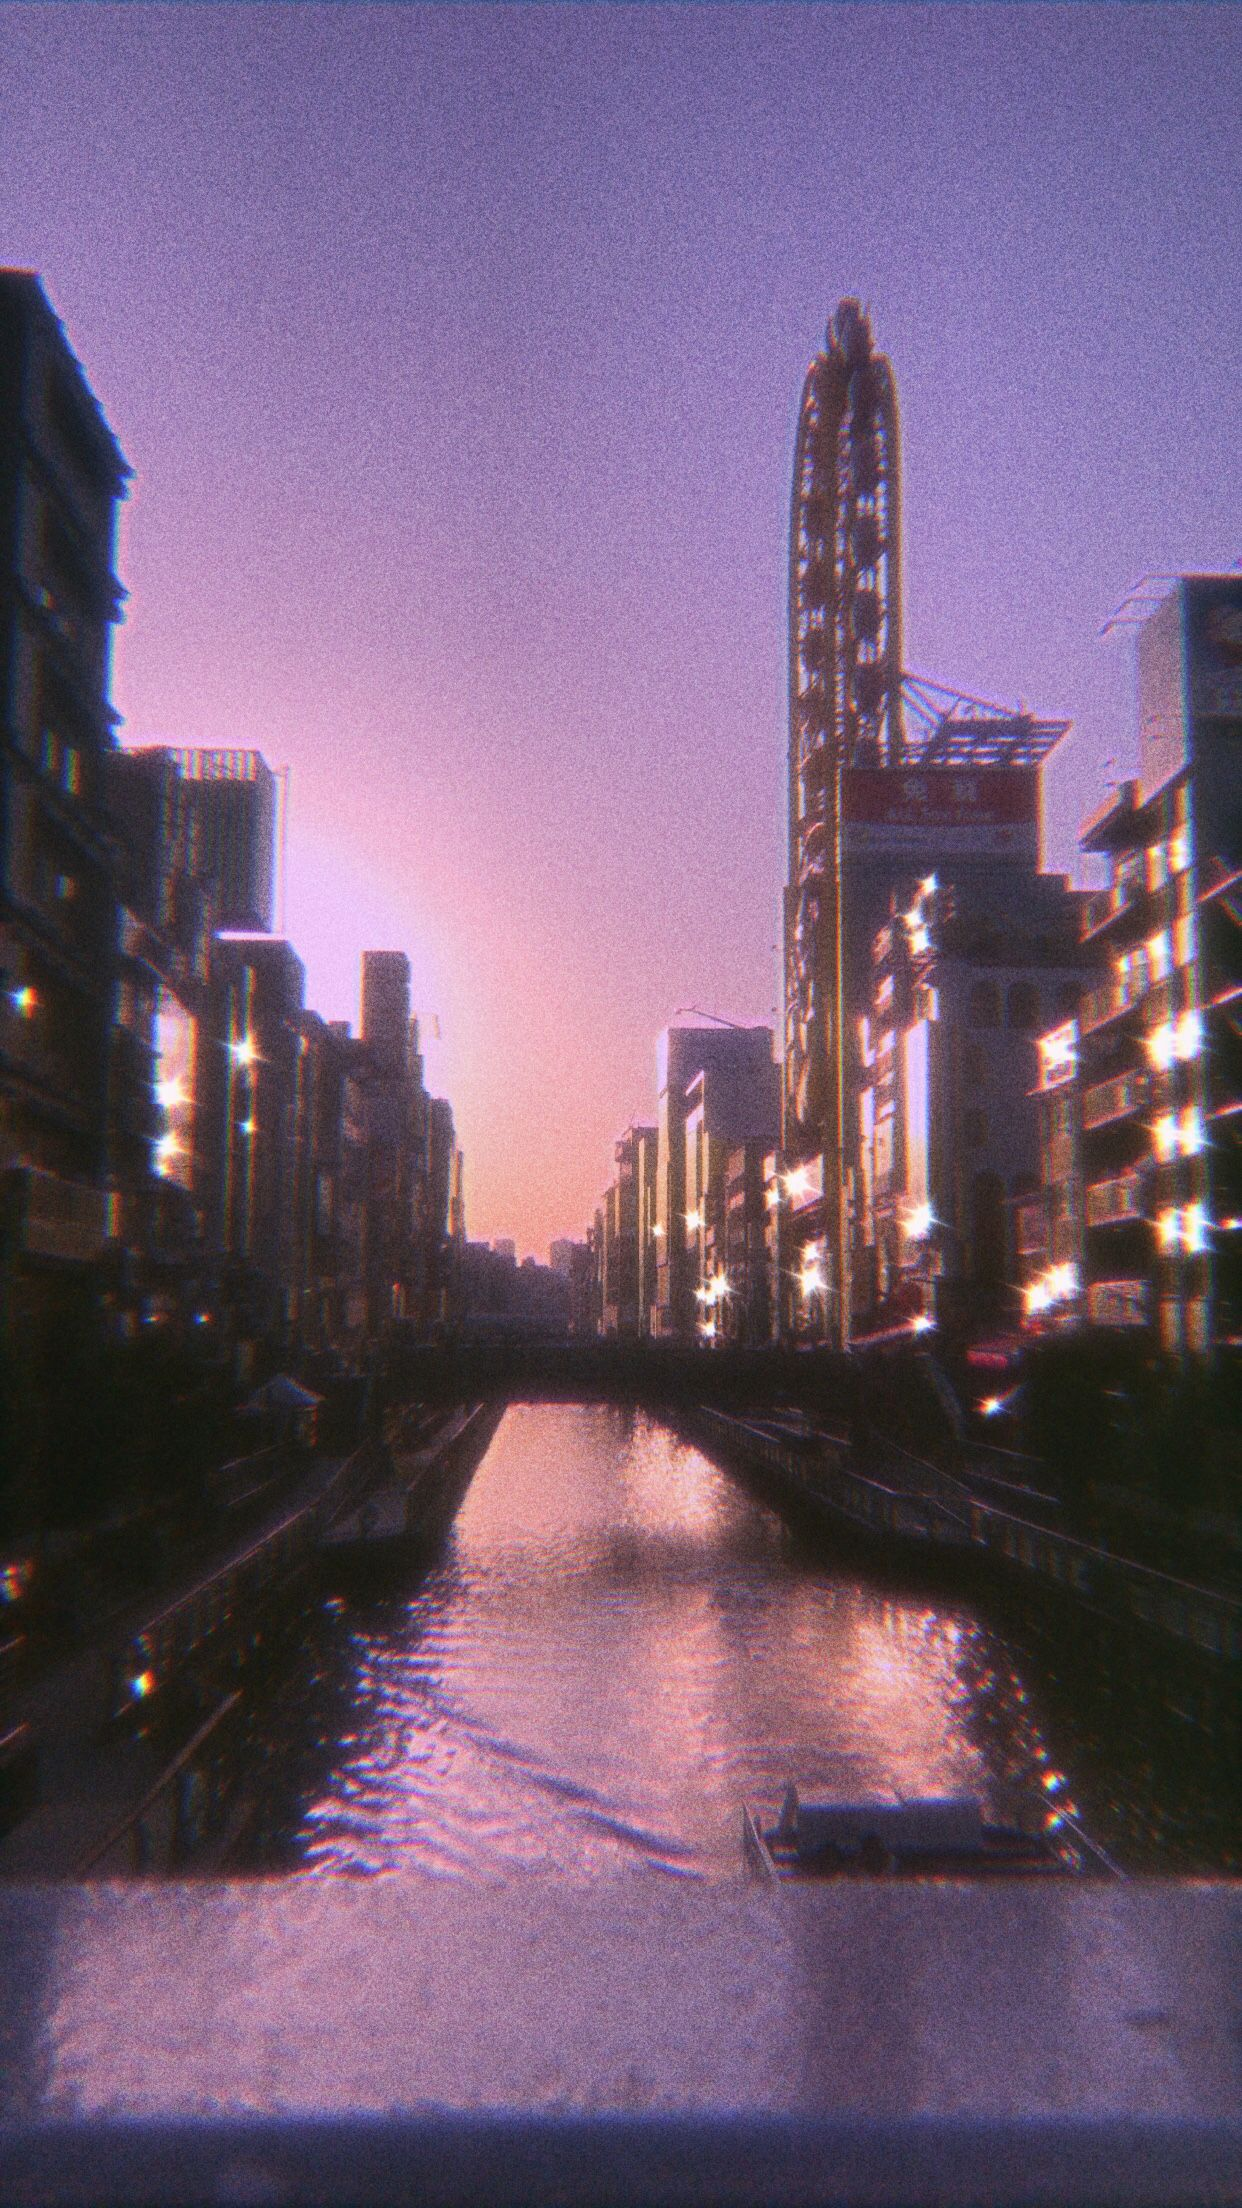 Osaka Japan Aesthetic Aesthetic Backgrounds Aesthetic Pictures Aesthetic Pastel Wallpaper